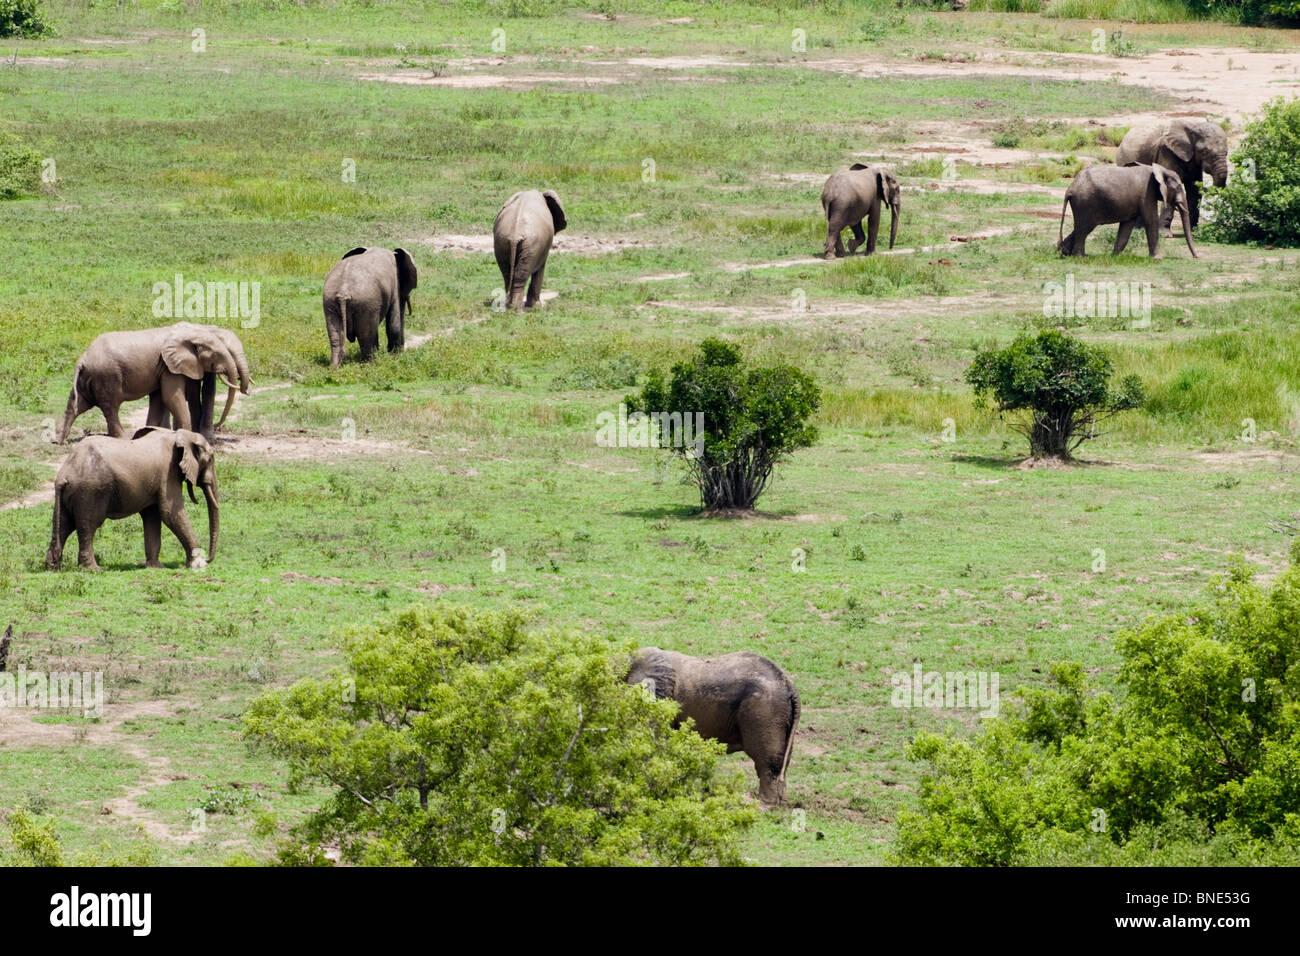 Herd of Savannah Elephants, Loxodonta africana, in Mole National Park, Ghana. - Stock Image